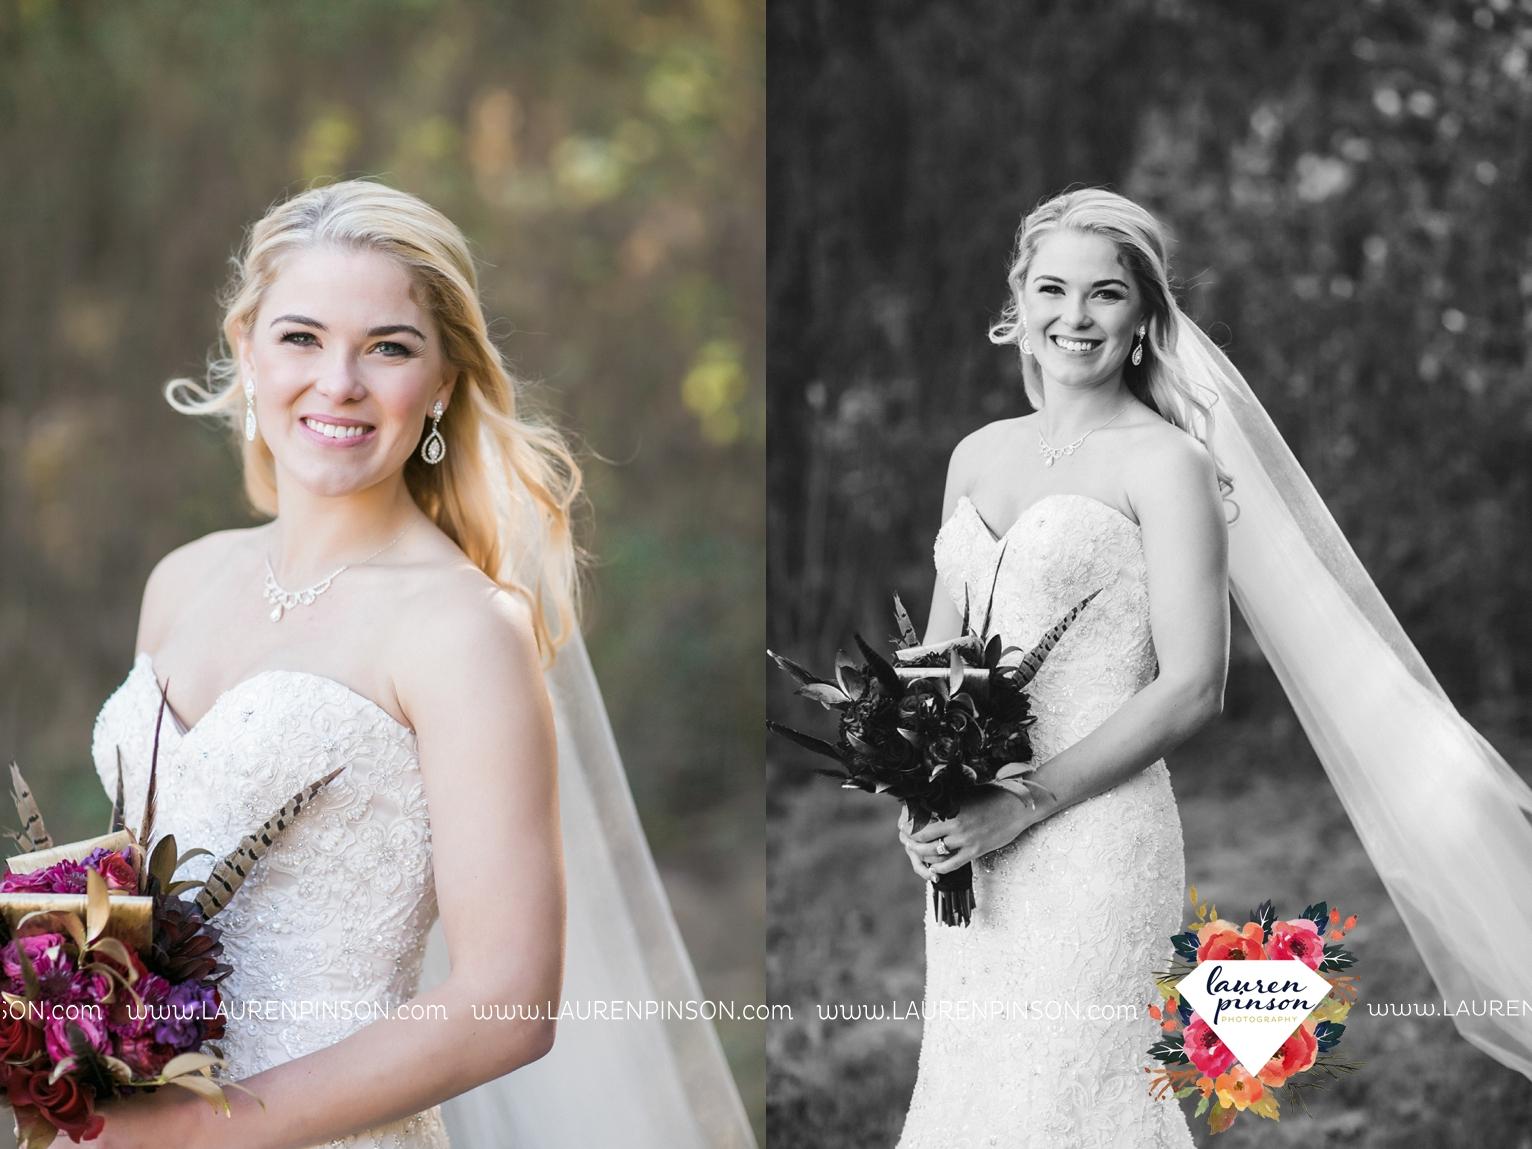 rustic-wichita-falls-texas-wedding-photographer-gold-glam-mayfield-events-market-street-united-allue-bridals-fall_1722.jpg